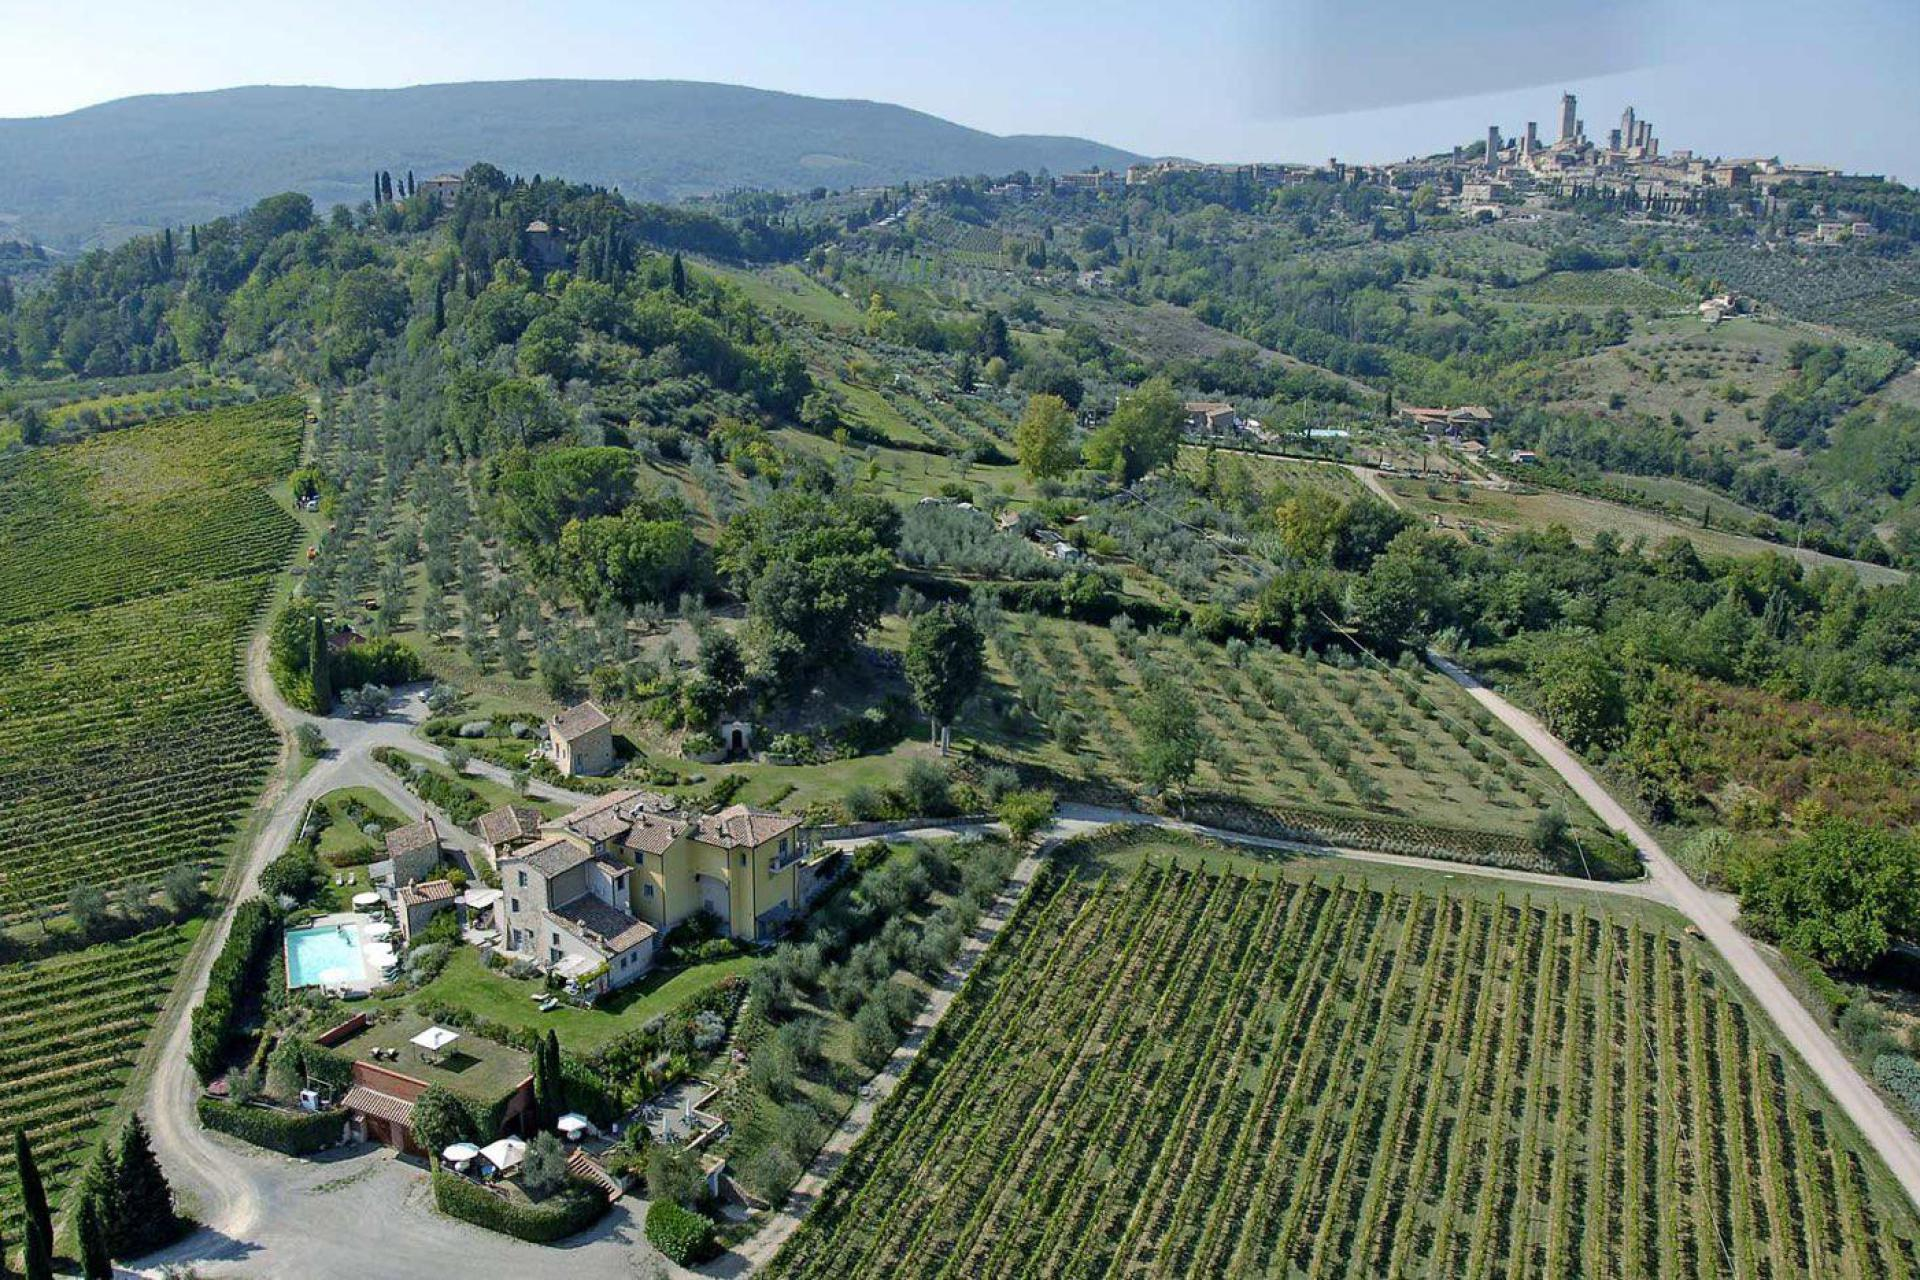 Agriturismo Toskana Kleiner Agriturismo mit Ausblick auf San Gimignano | myitalyselection.de